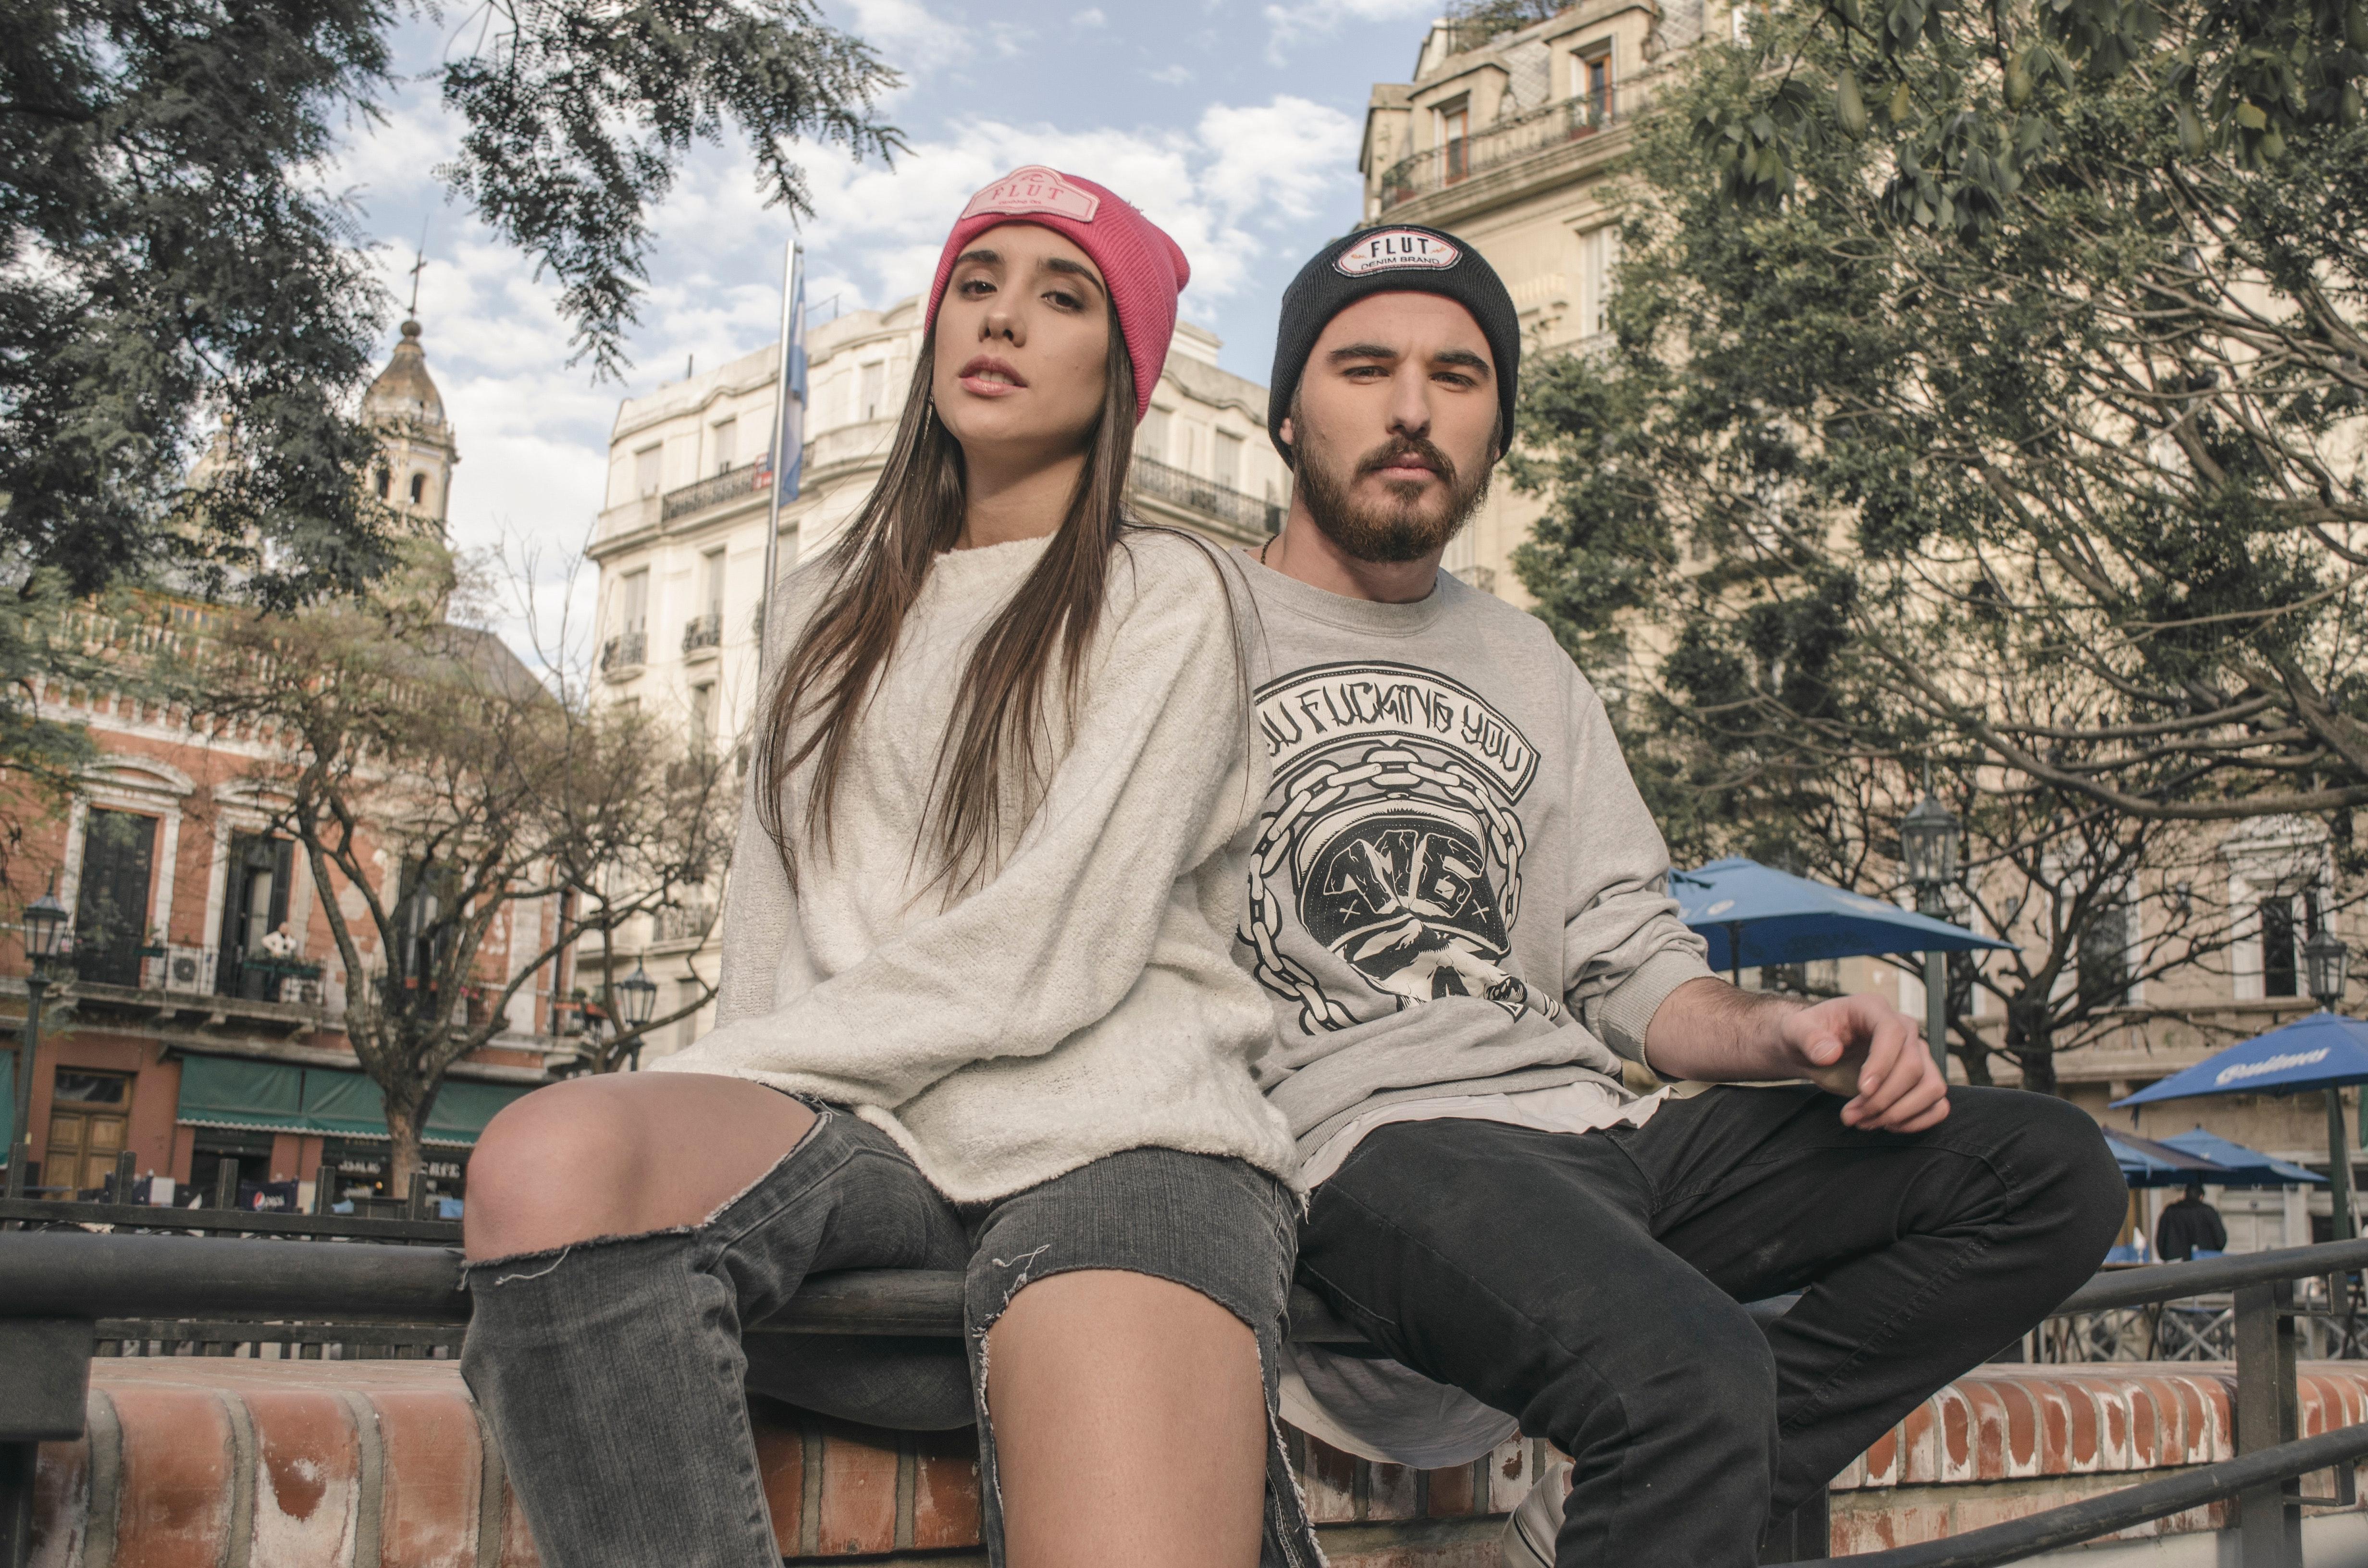 Couple sitting on raillings photo